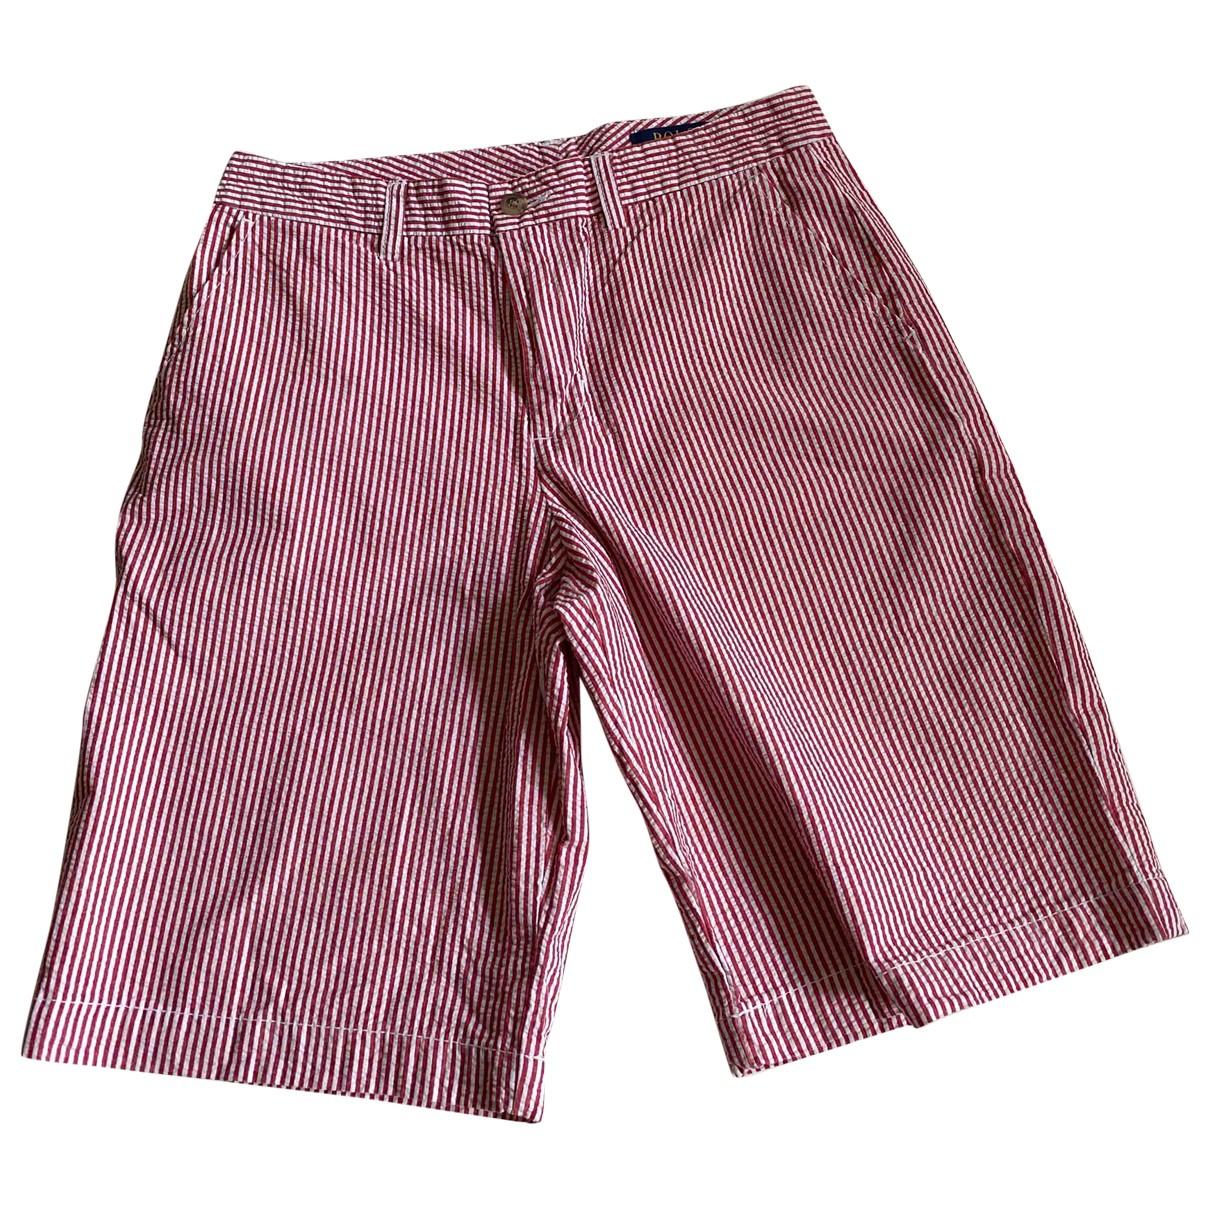 Polo Ralph Lauren \N Shorts in  Rot Baumwolle